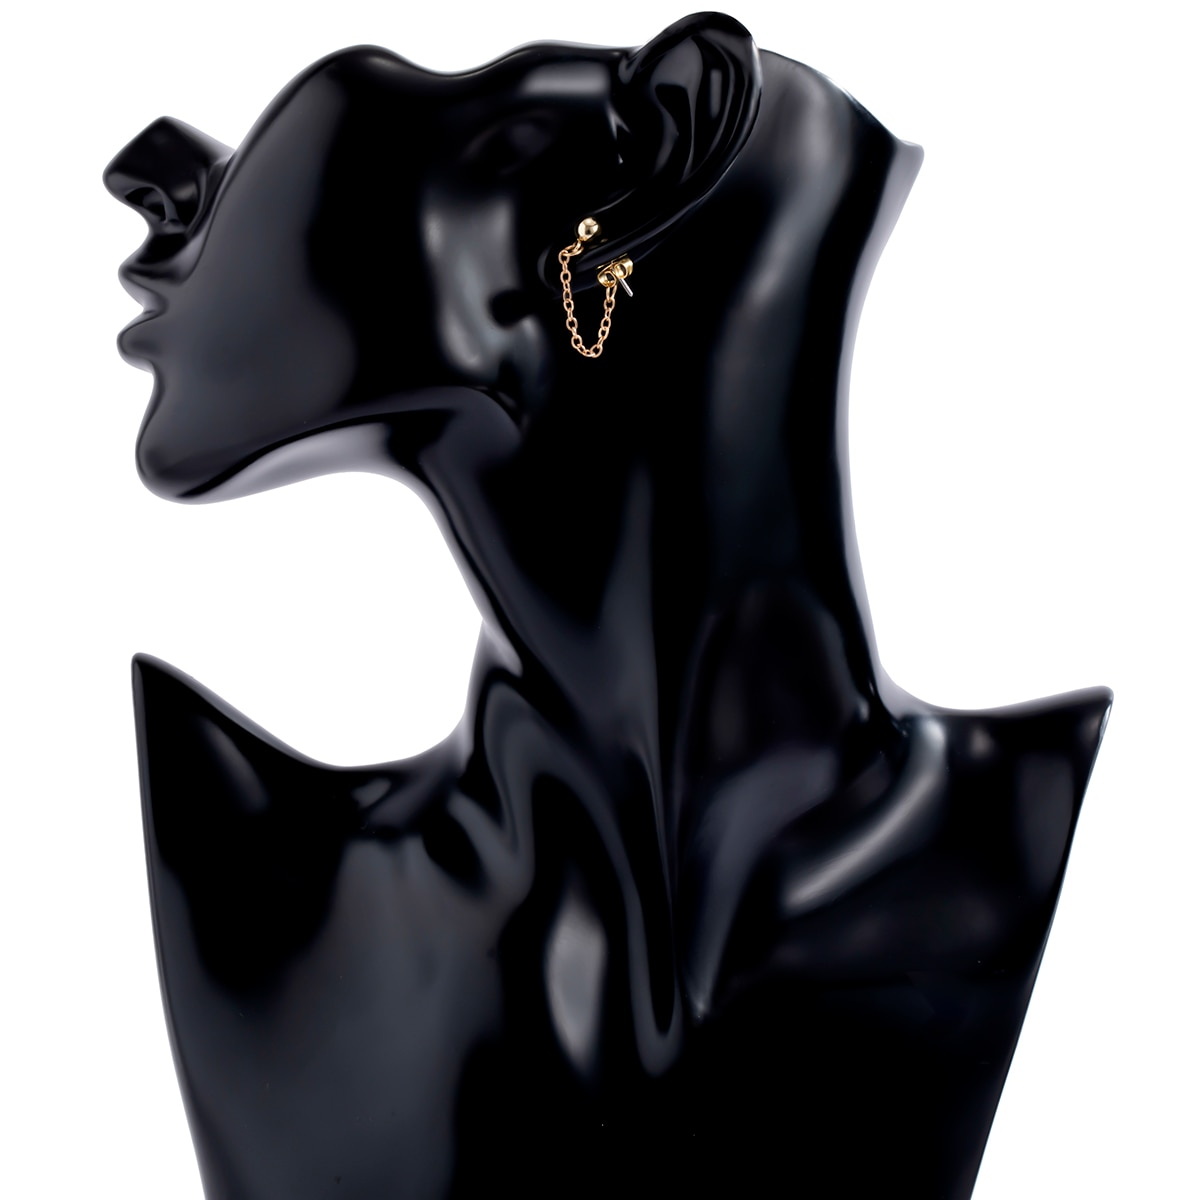 4Pcs/Set Bohemian Exquisite Earrings Fashion Angel Geometric Dangle Baroque Pearls Drop Earrings For Women Punk Brinco Jewelry  - buy with discount